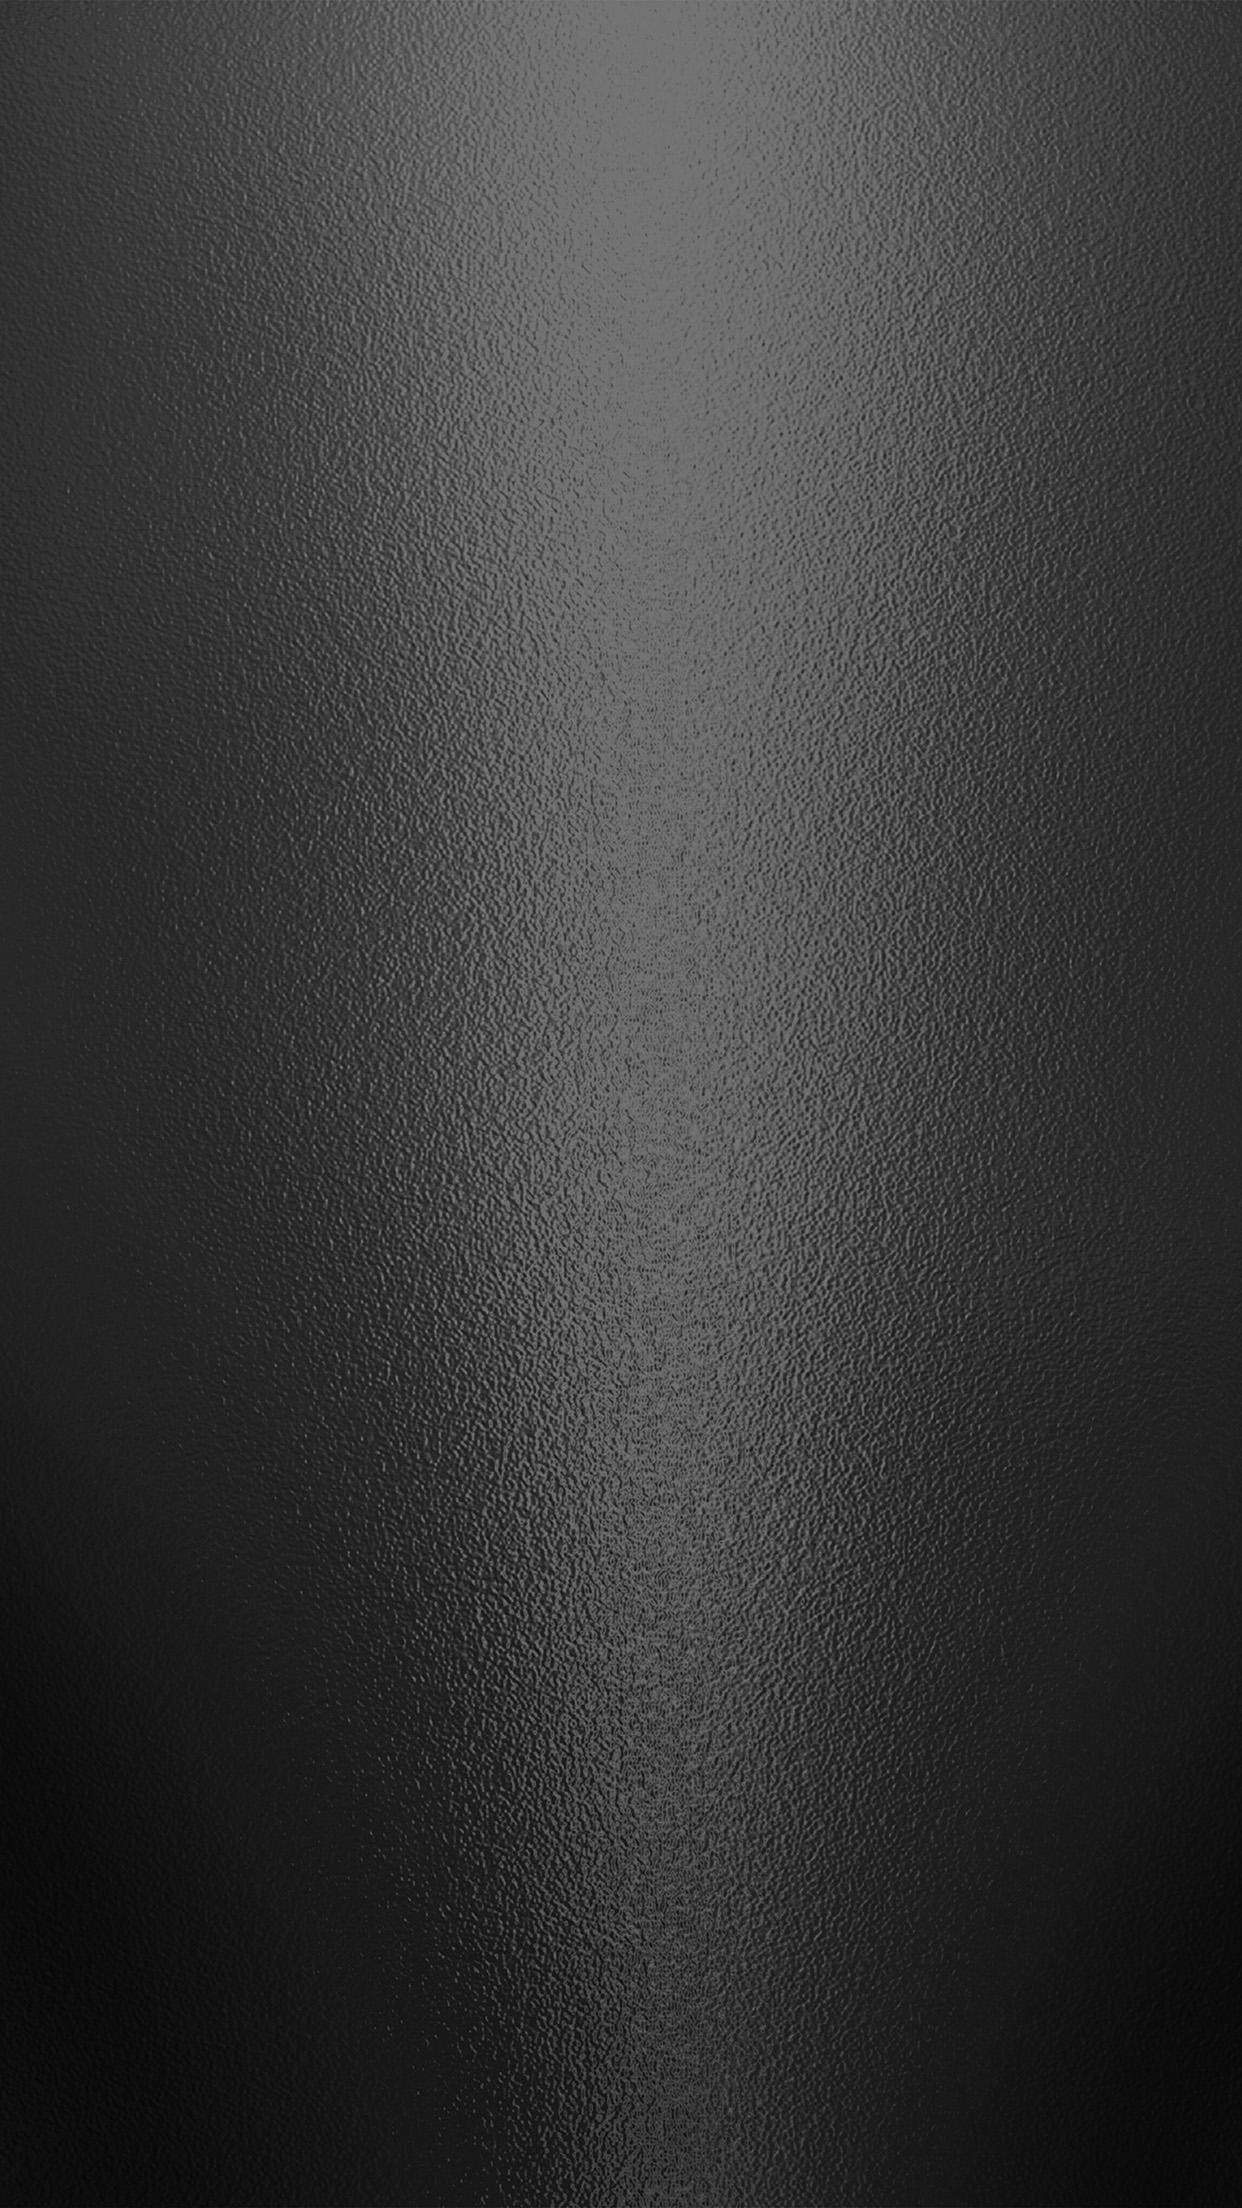 Vr46 Texture Dark Black Metal Pattern Wallpaper